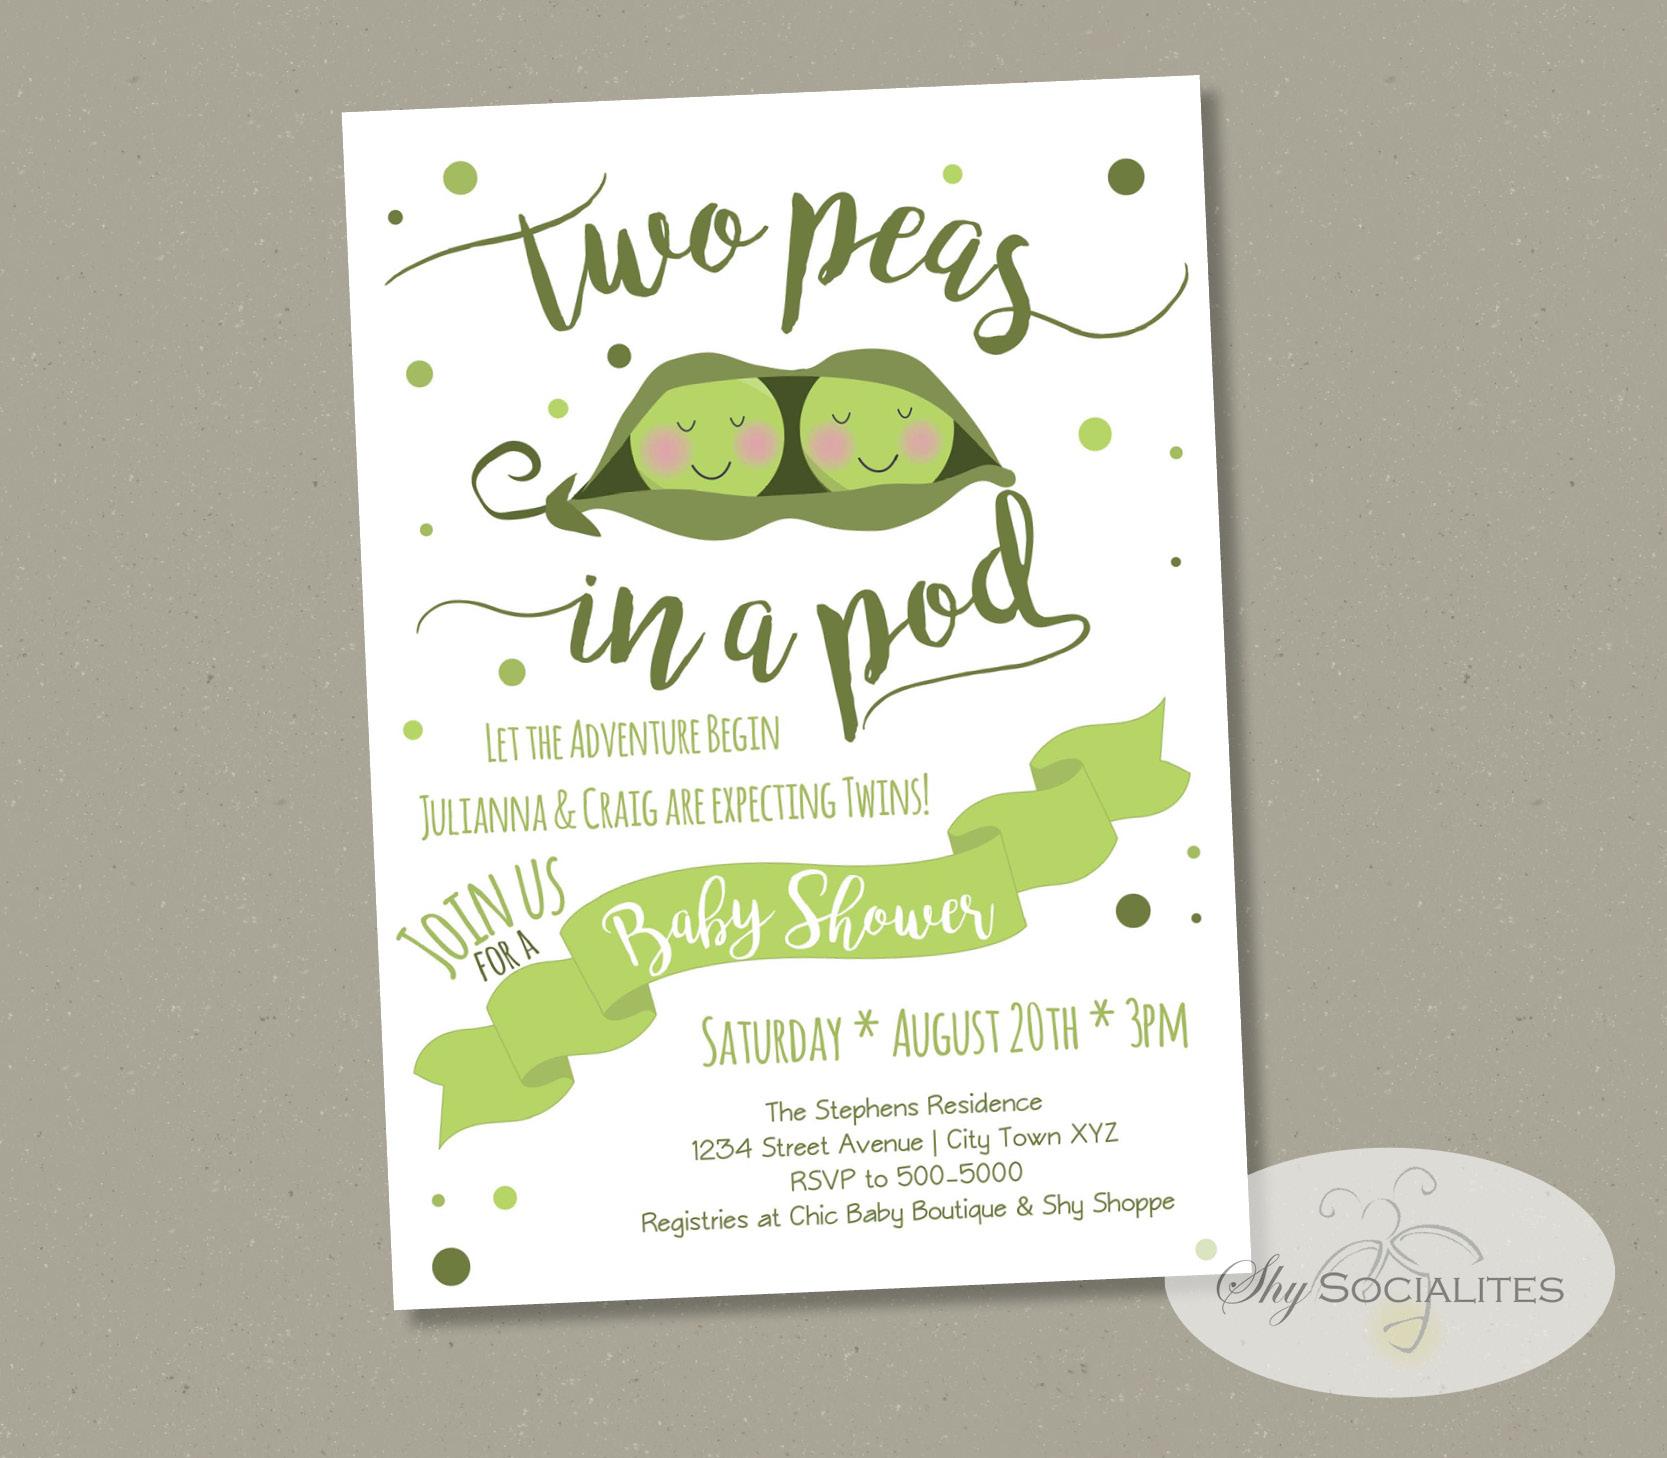 Print Yourself Bridal Shower Invitations